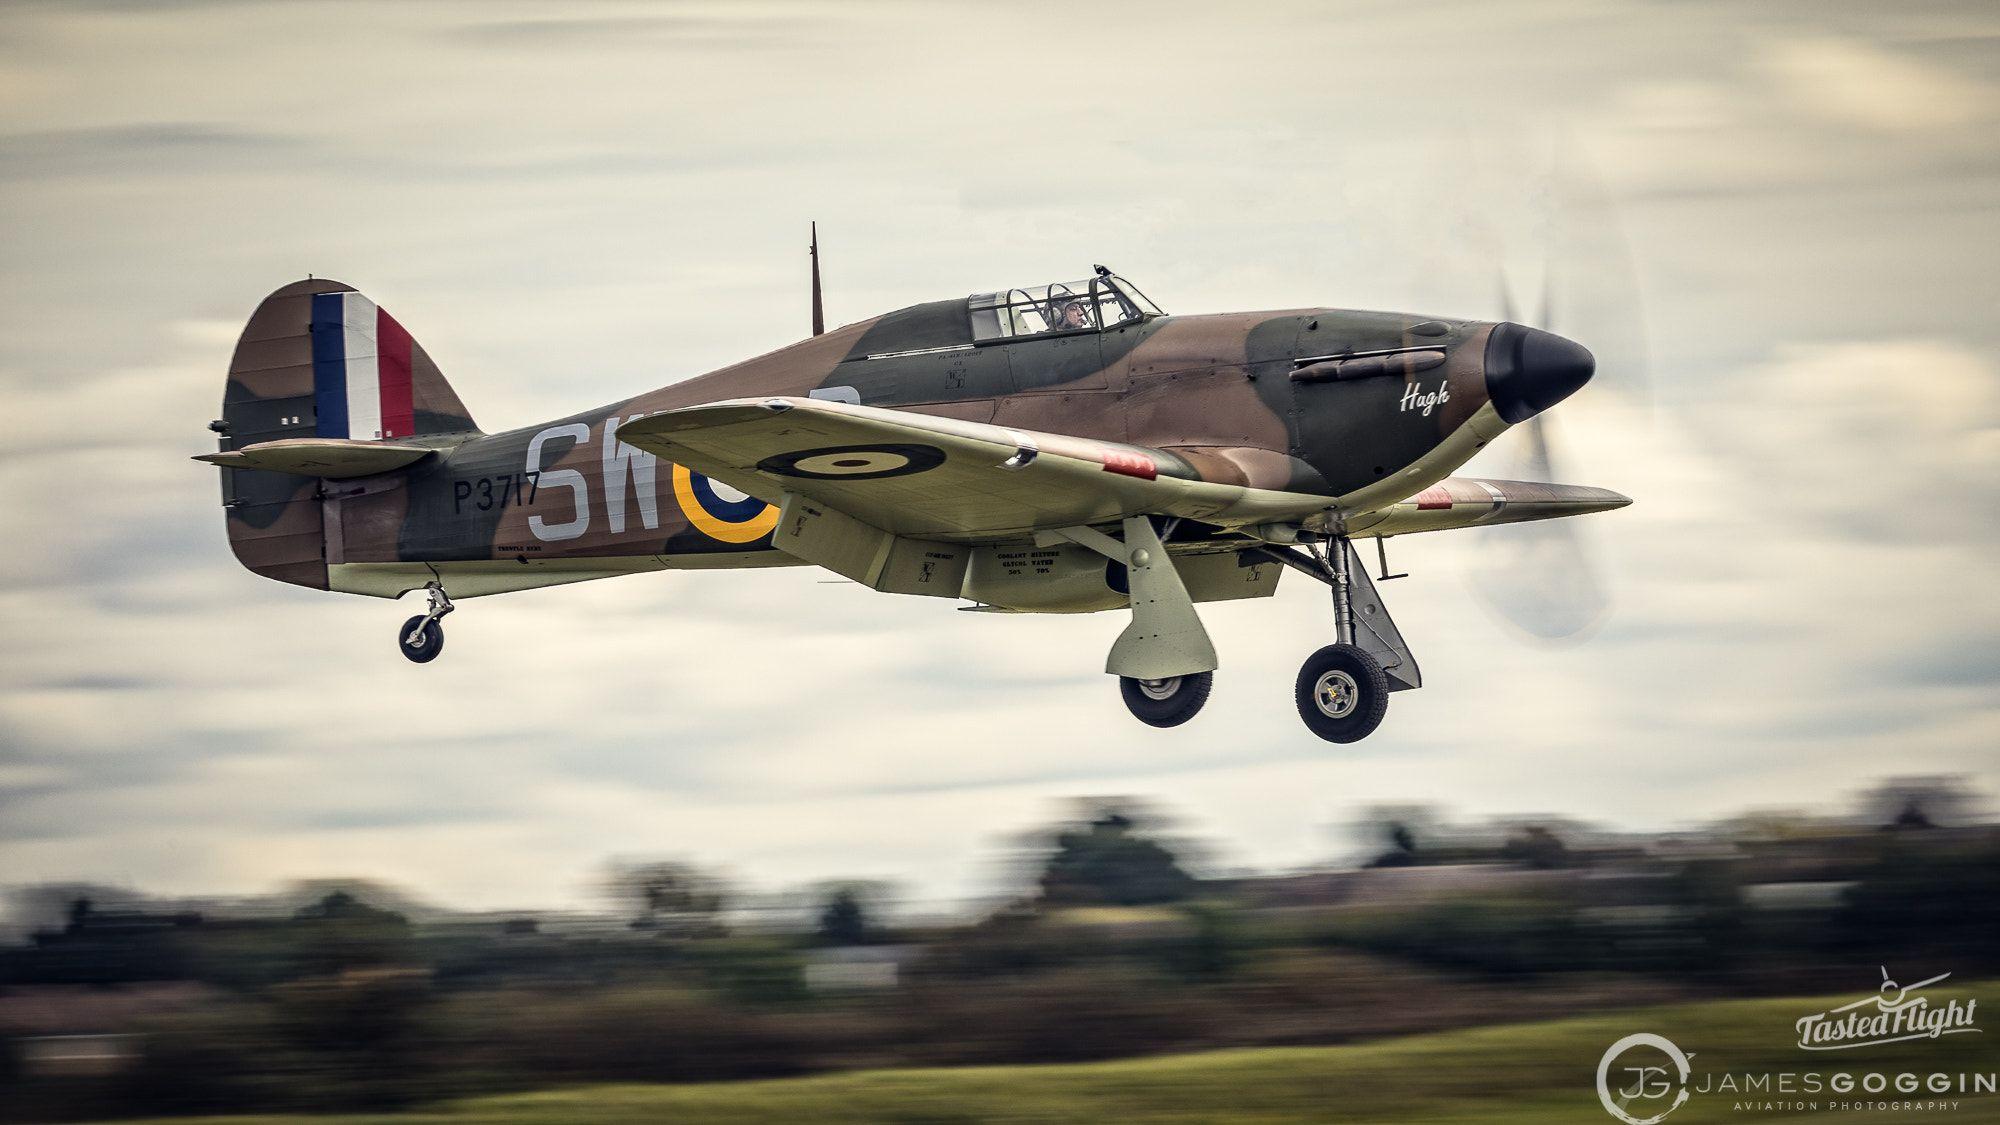 Jg 17 100074 Cr2 Hawker Hurricane Mk I P3717 Sw P G Hitt Bygone Aviation Ltd Hawker Hurricane Navy Aircraft